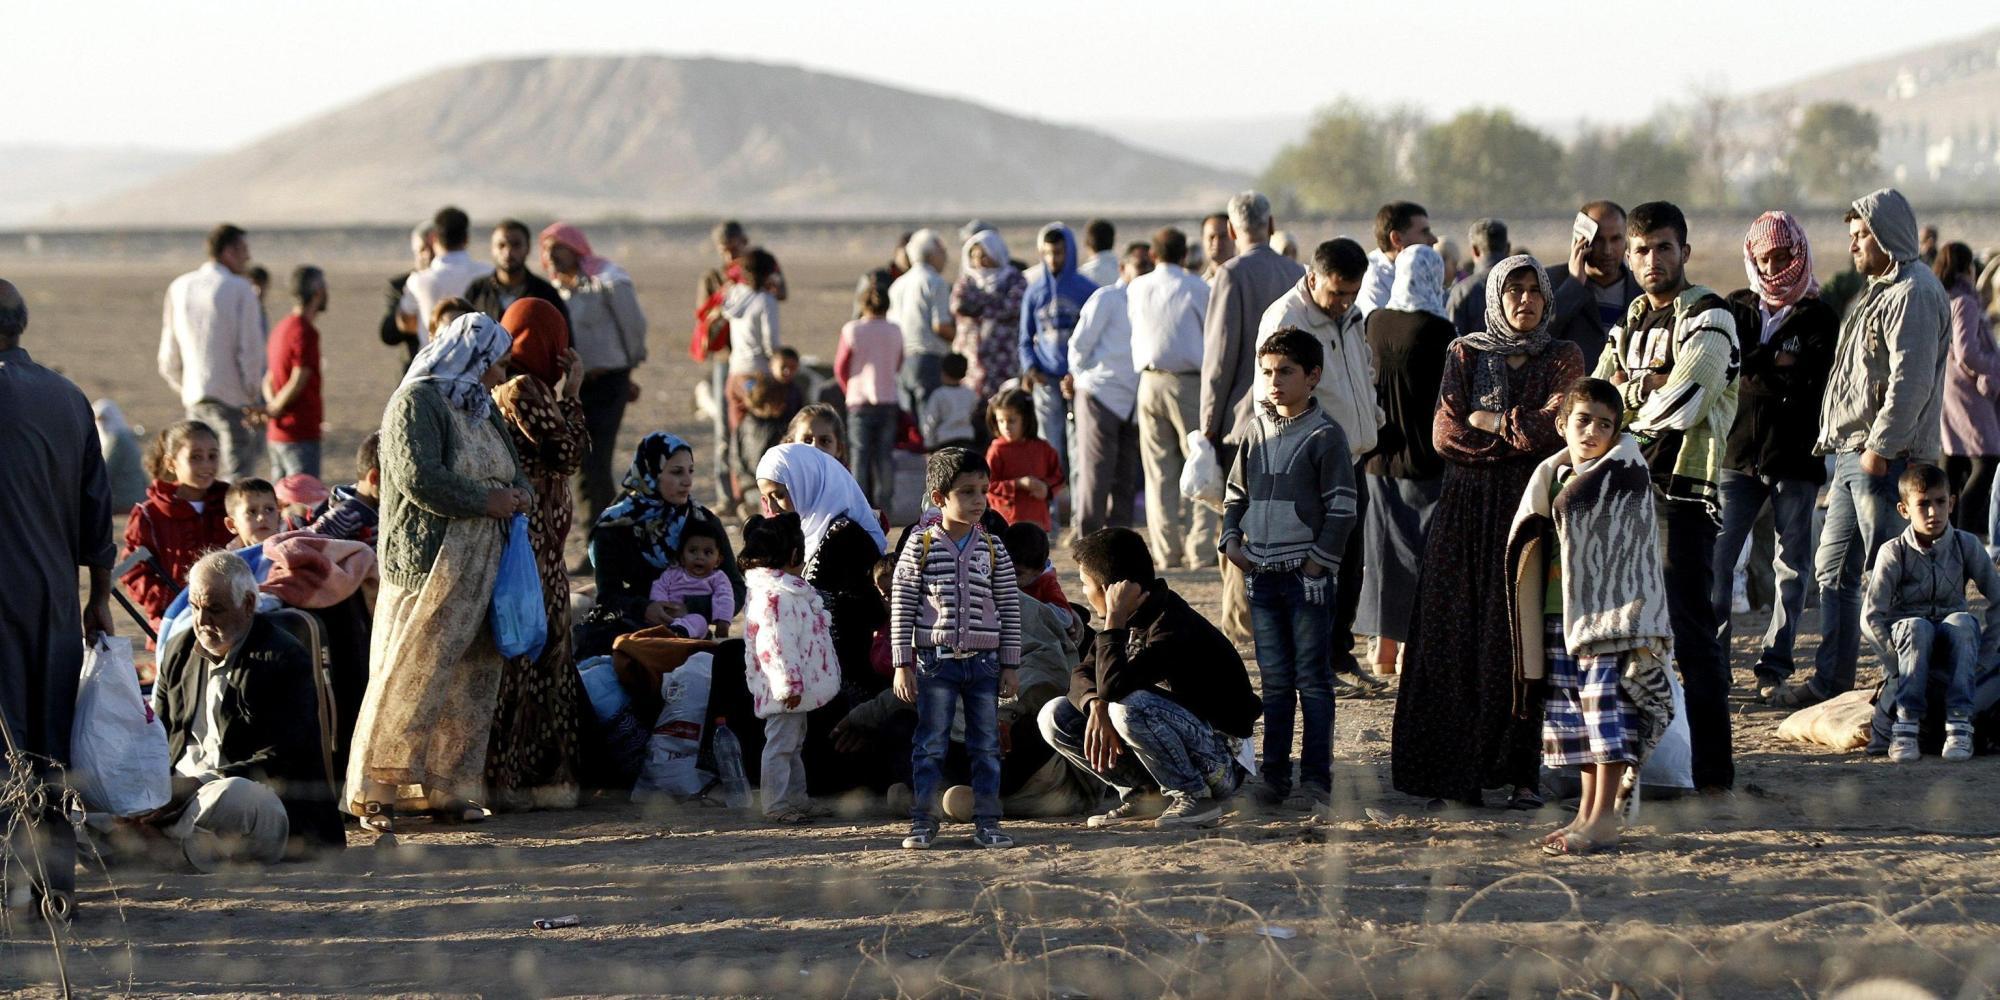 ++ Isis: Onu,100.000 curdi fuggiti dalla Siria in Turchia ++